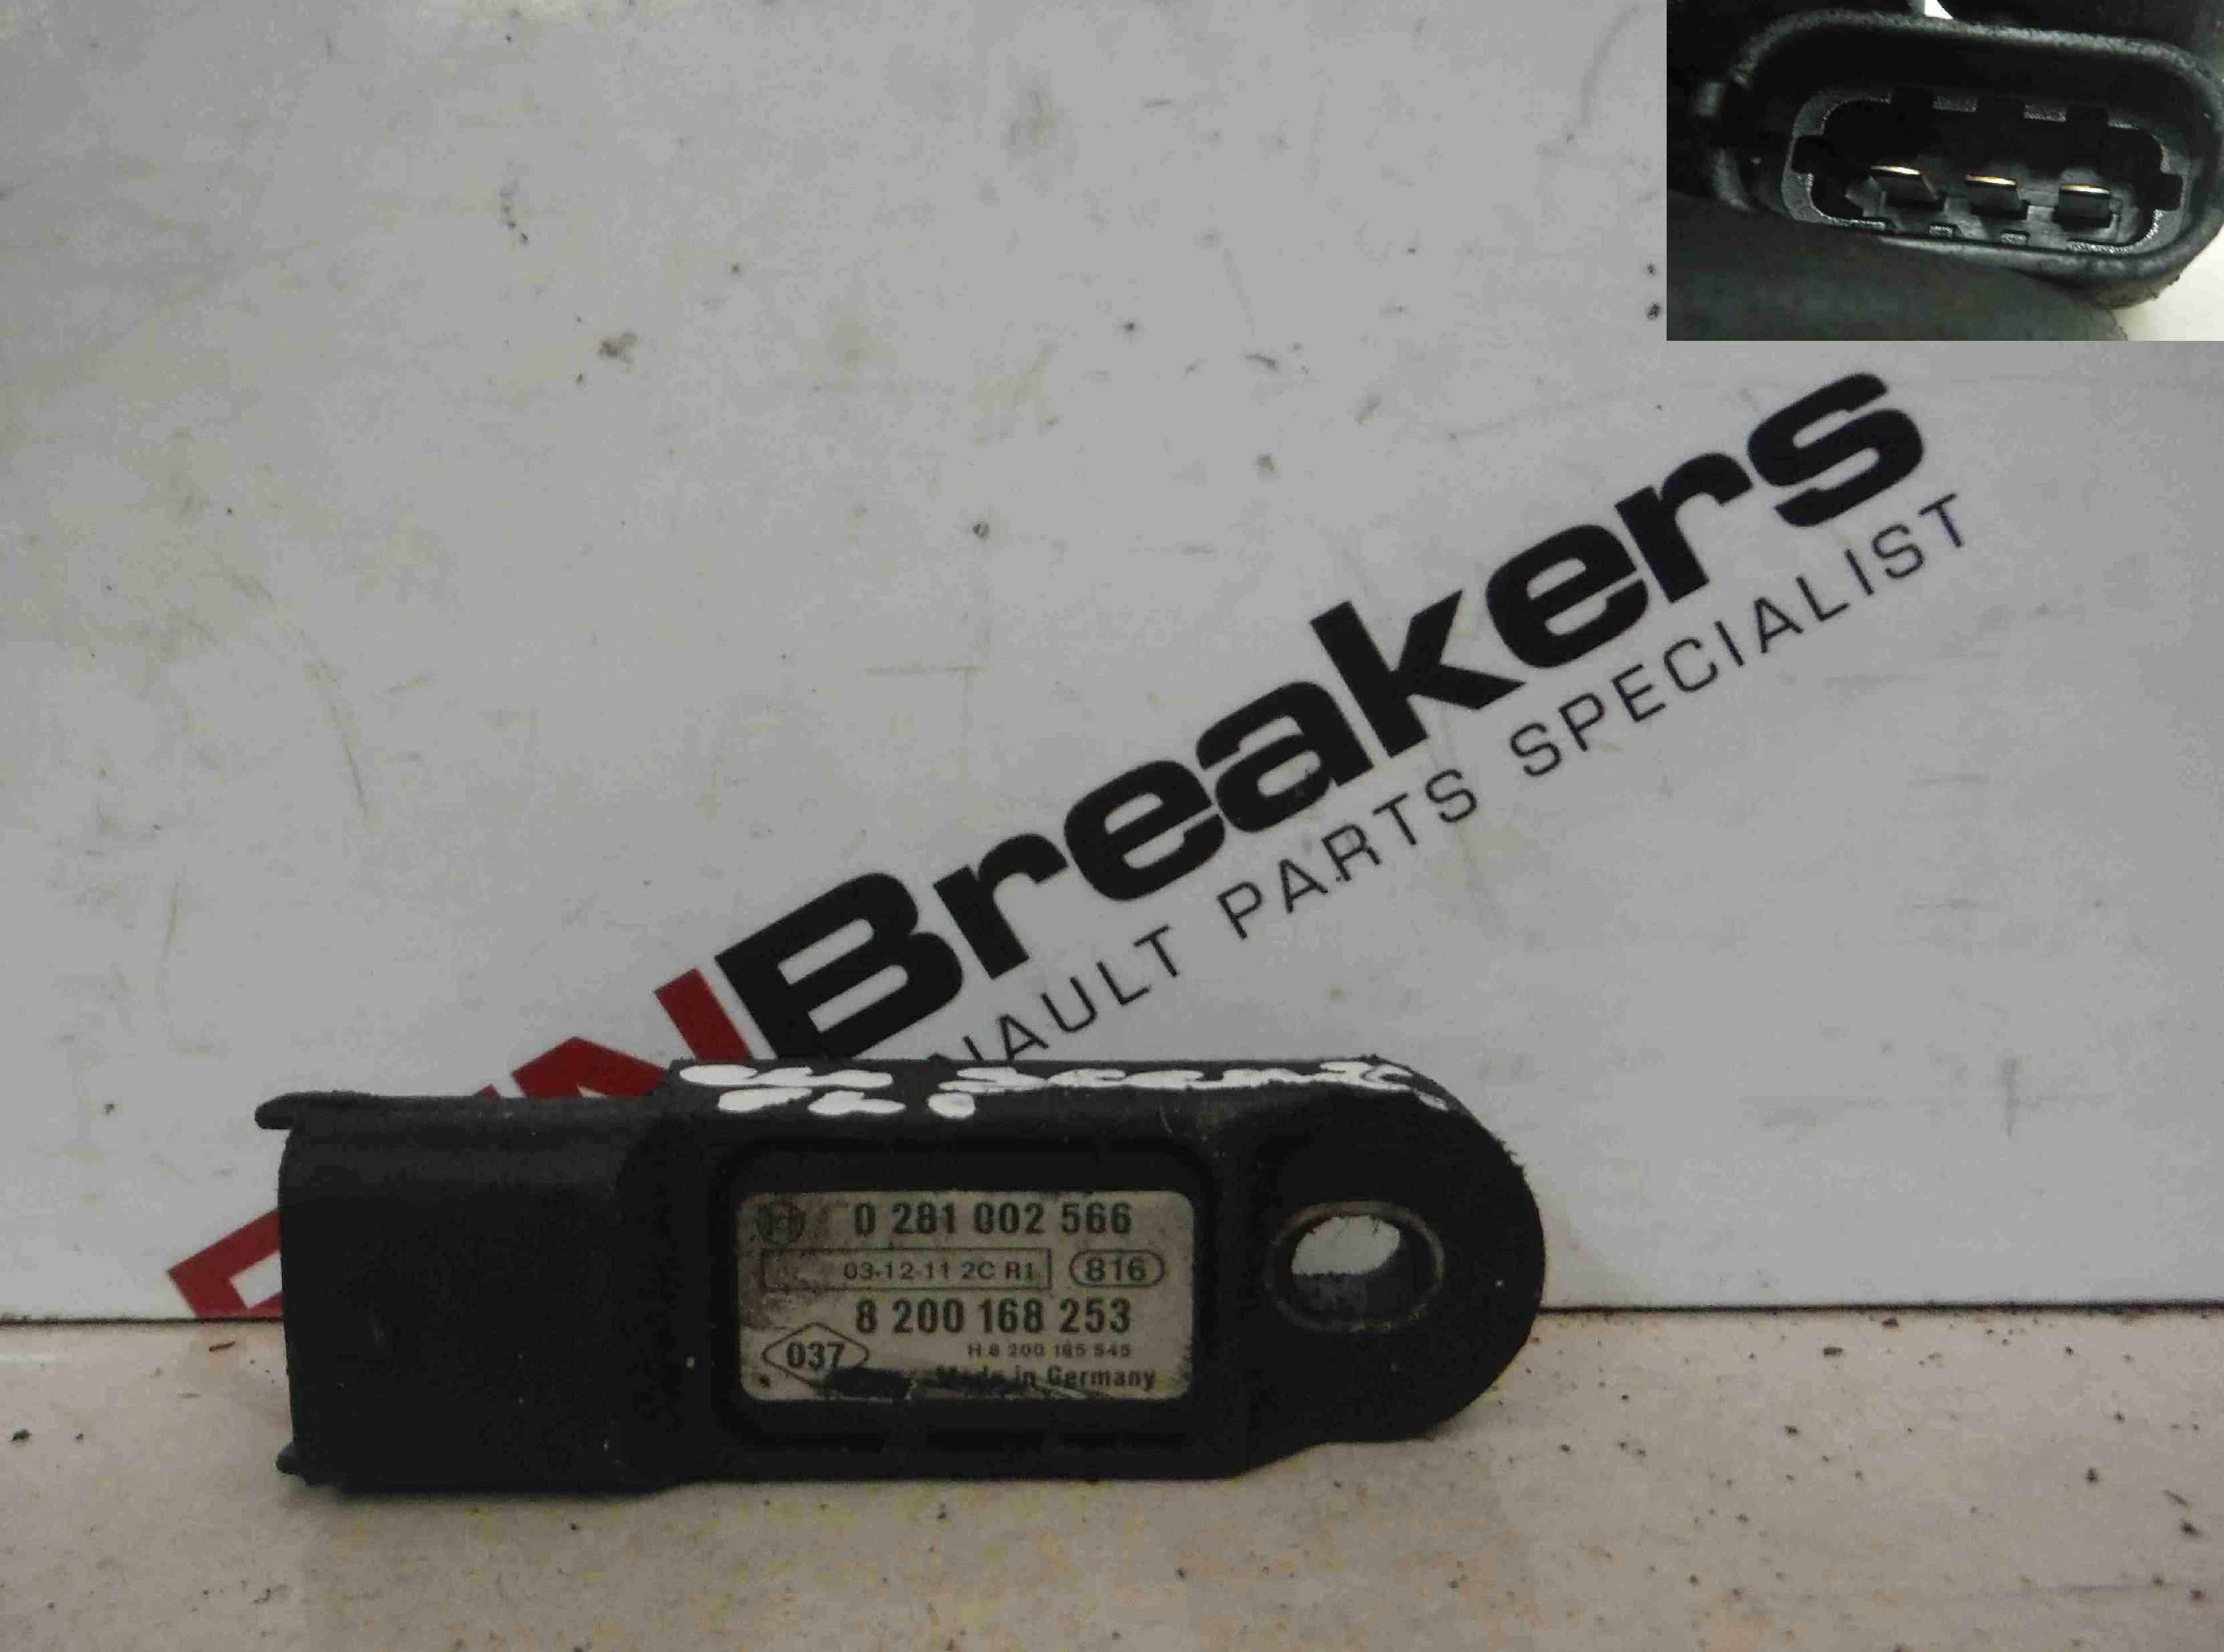 Renault Megane + Scenic 2001-2009 Inlet Manifold Map Sensor 8200168253